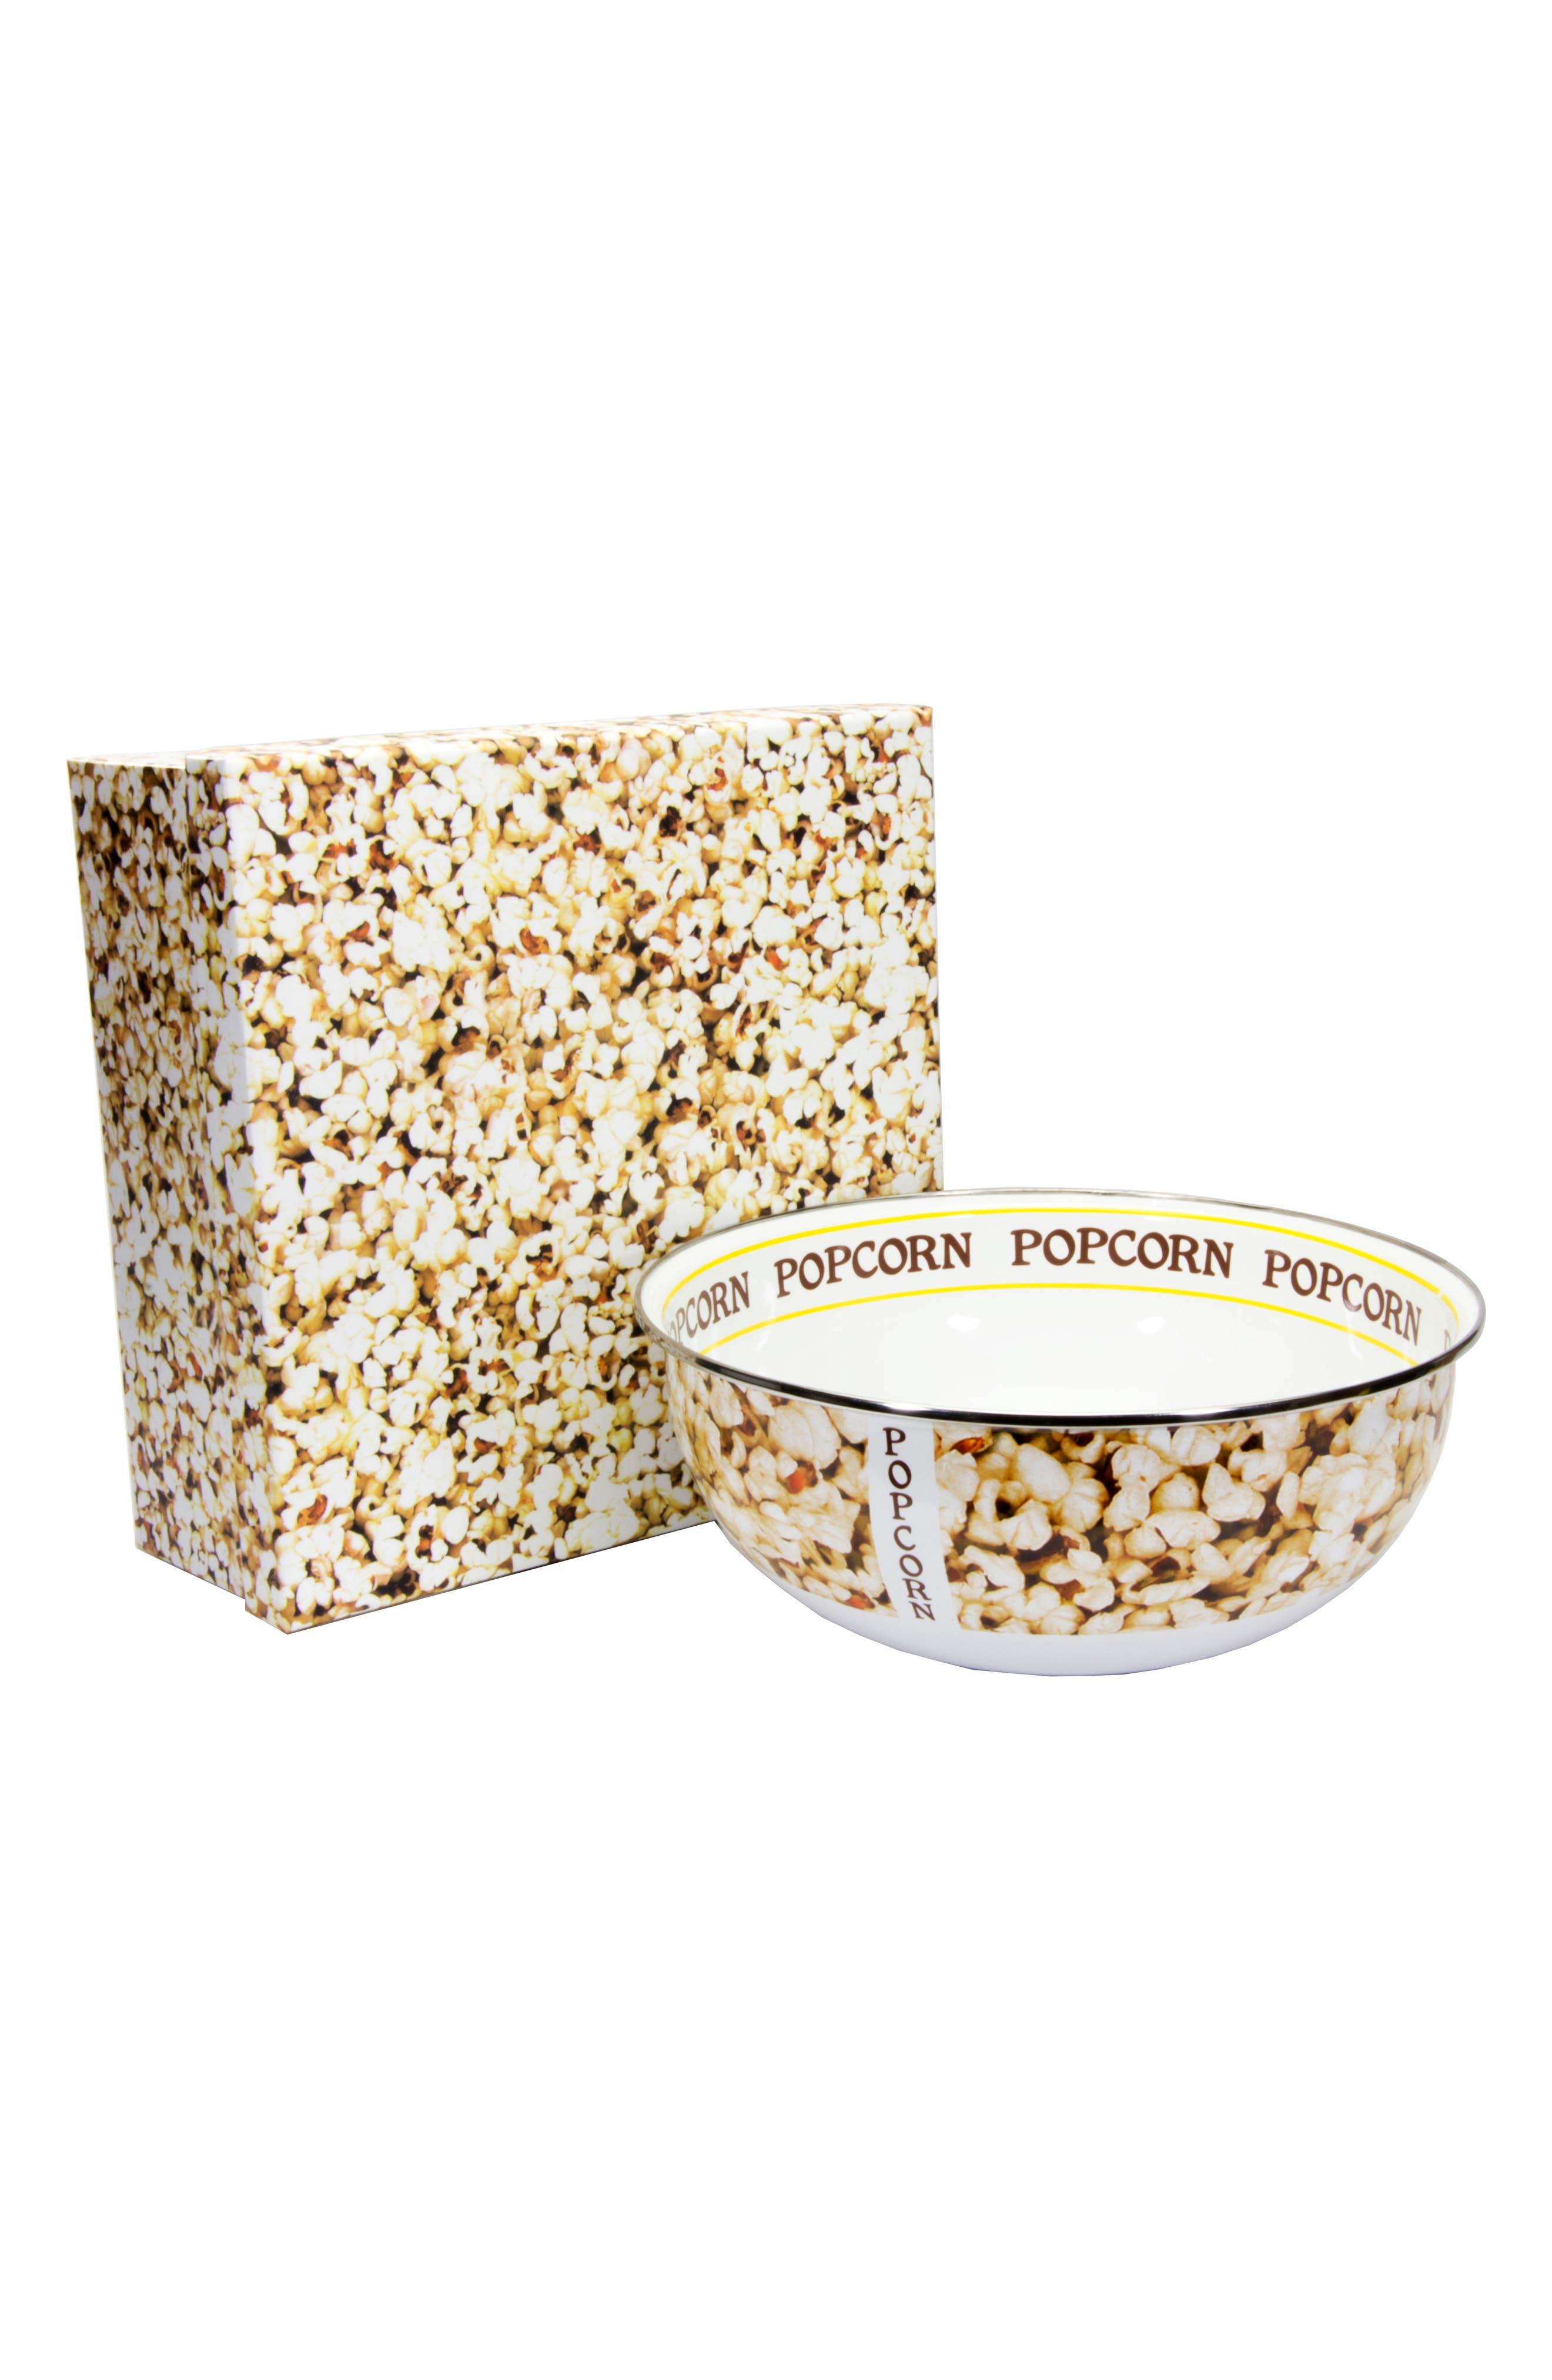 Popcorn Bowl,                         Main,                         color, 250